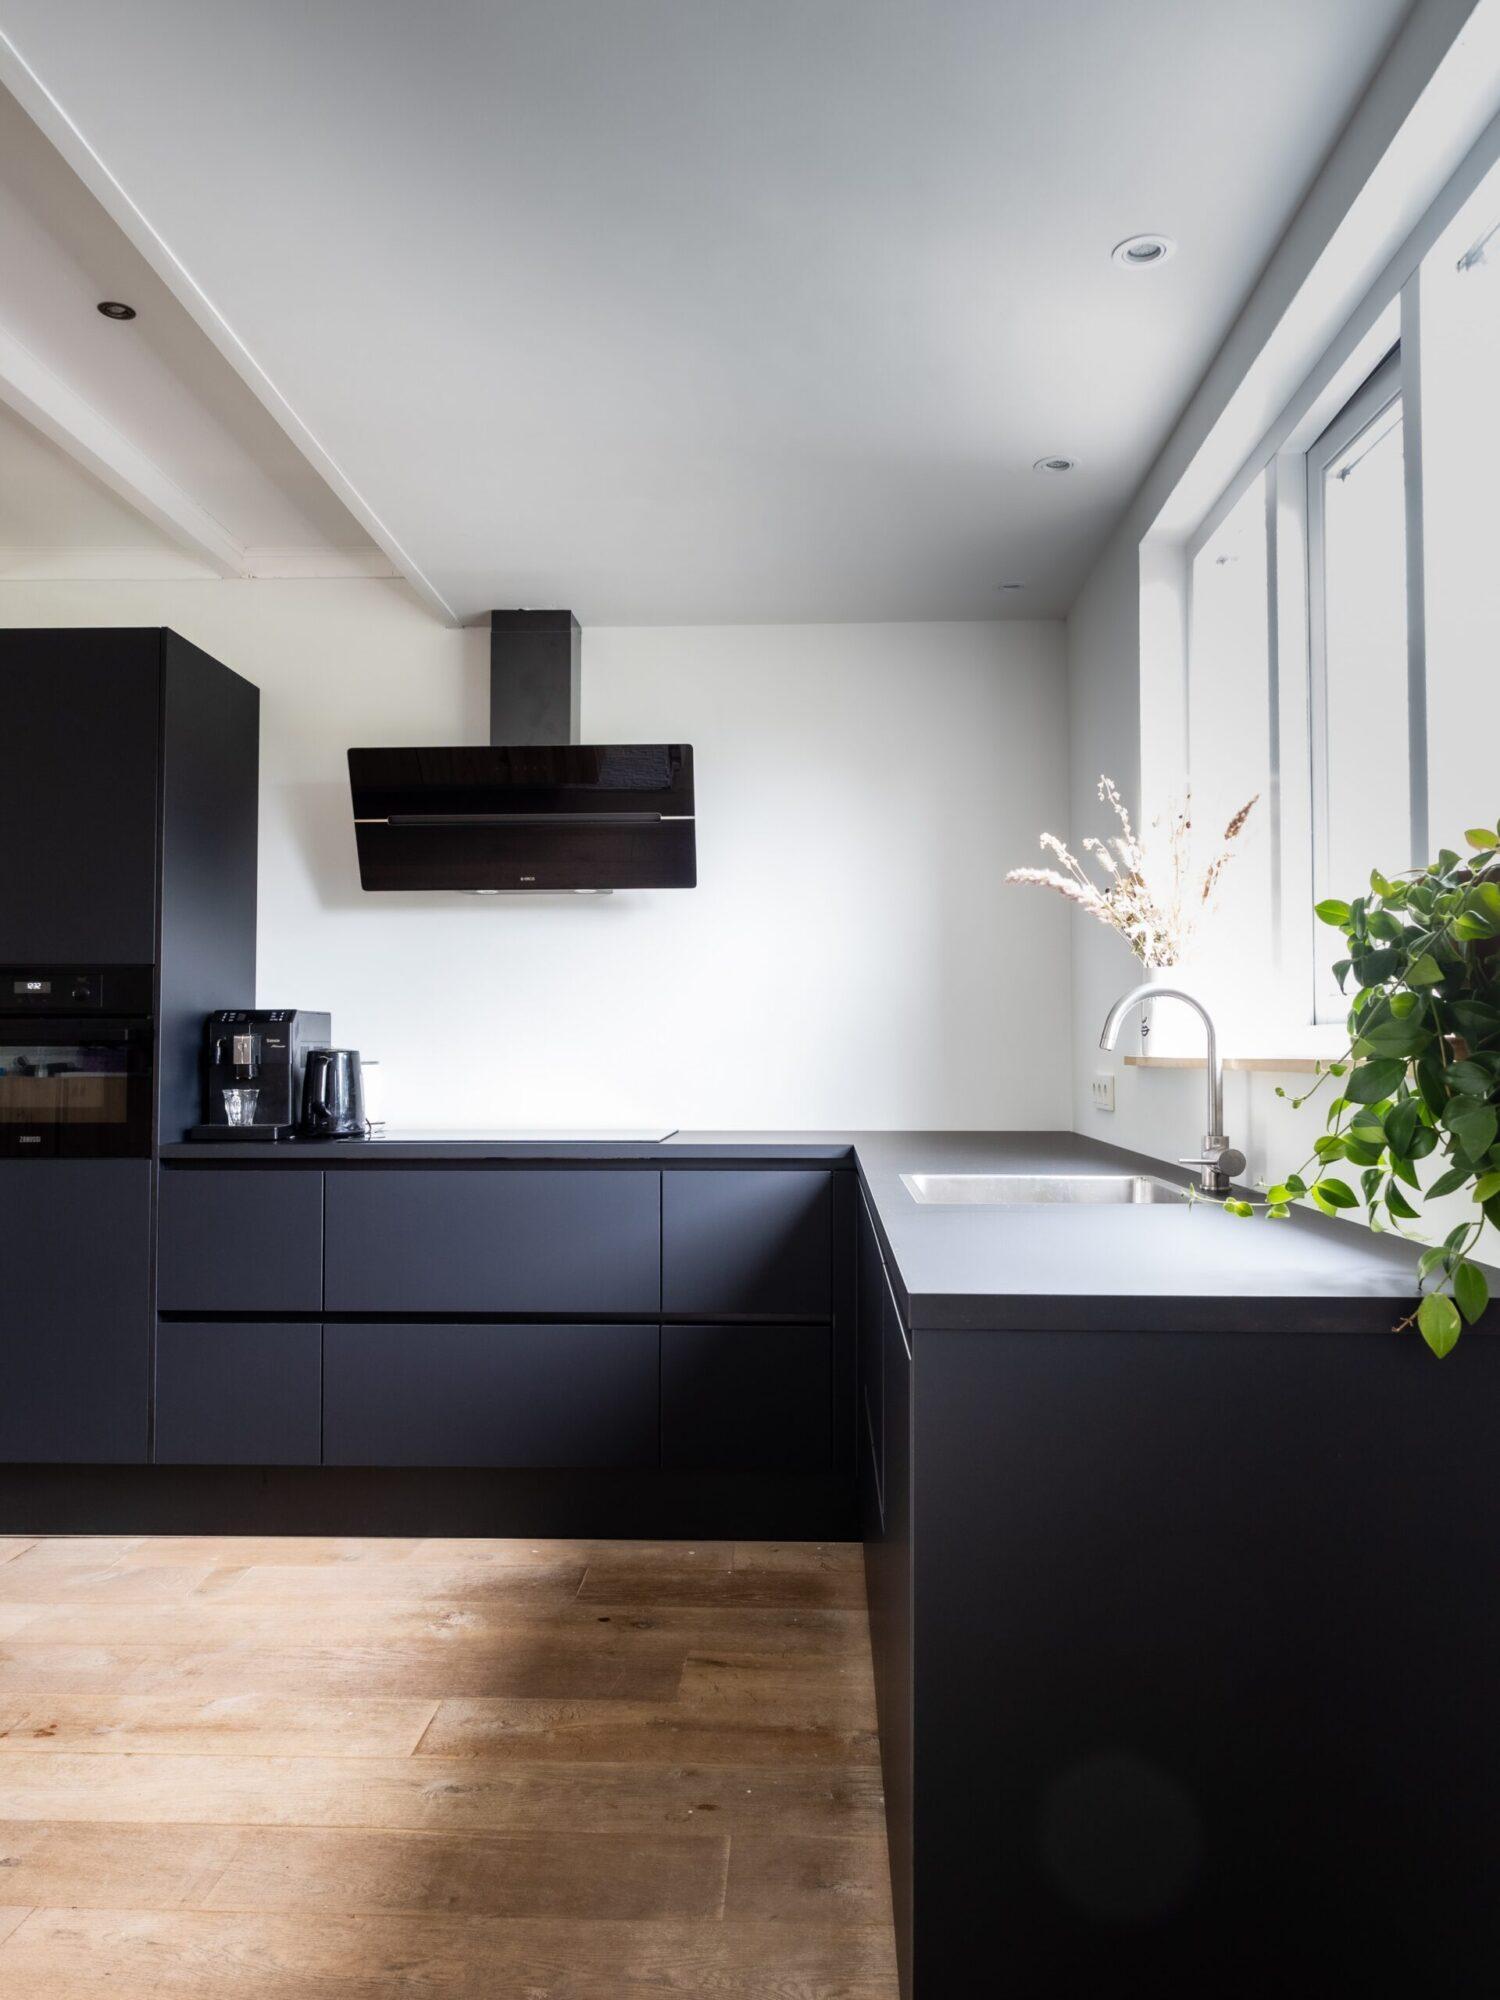 Black kitchen inspiration appliances black friday discount cheap fridge dishwasher microwave soundbar tv